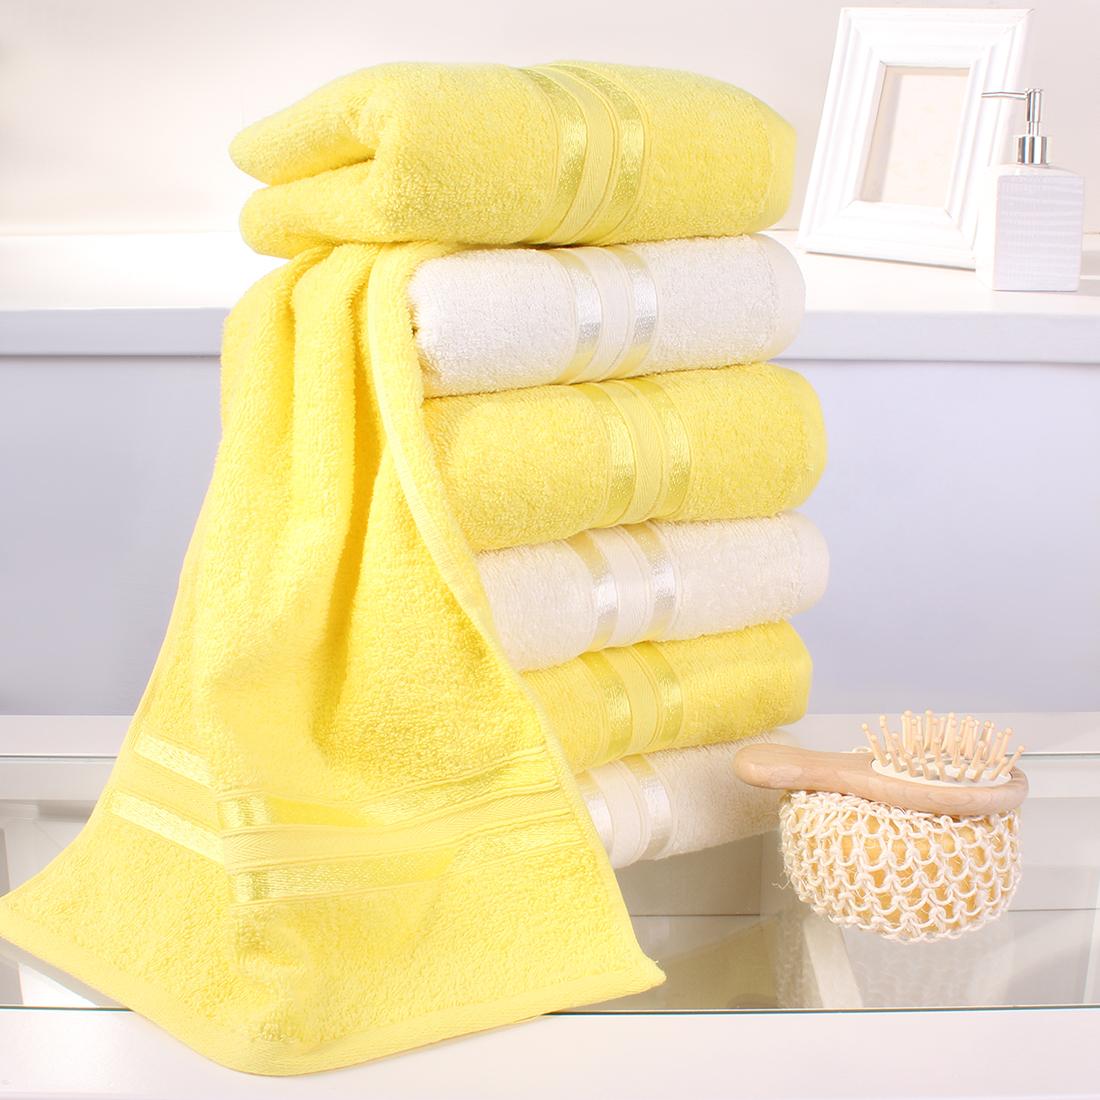 Купить Полотенца Dome, Полотенце для рук Harmonika Цвет: Молочный, Желтый (33х50 см - 6 шт), Дания, Махра